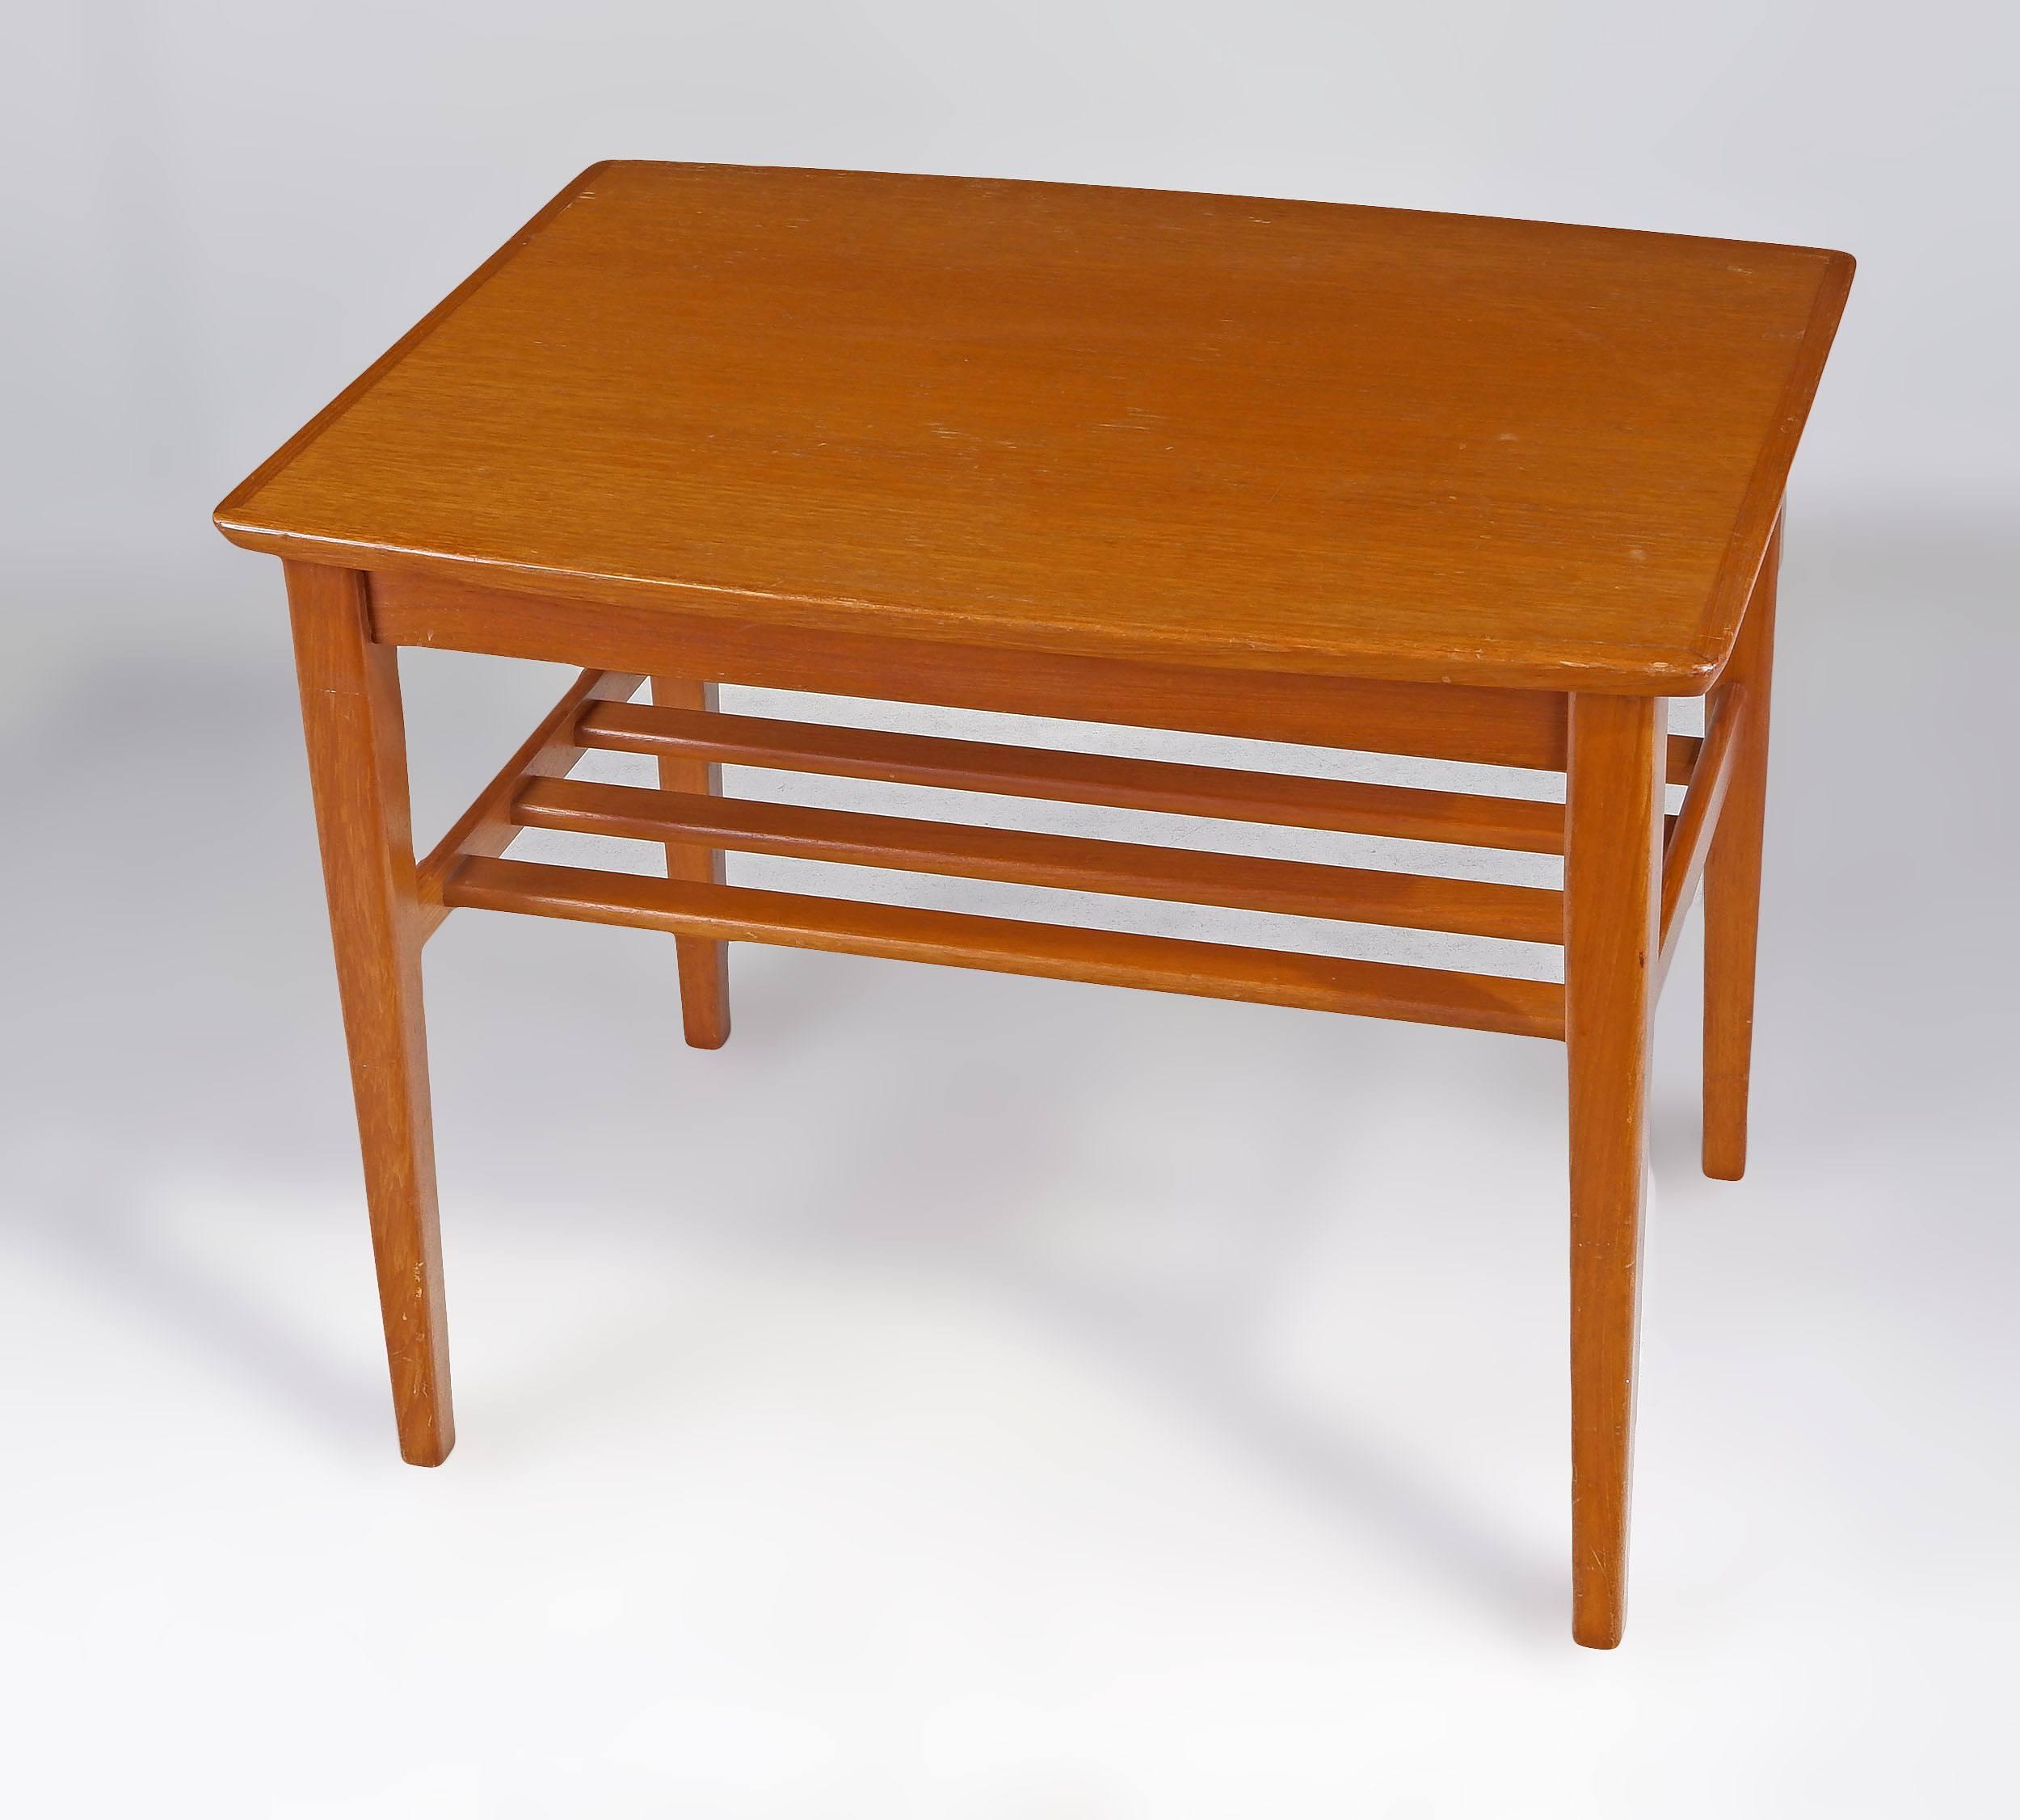 '1960s Teak Lamp Table'